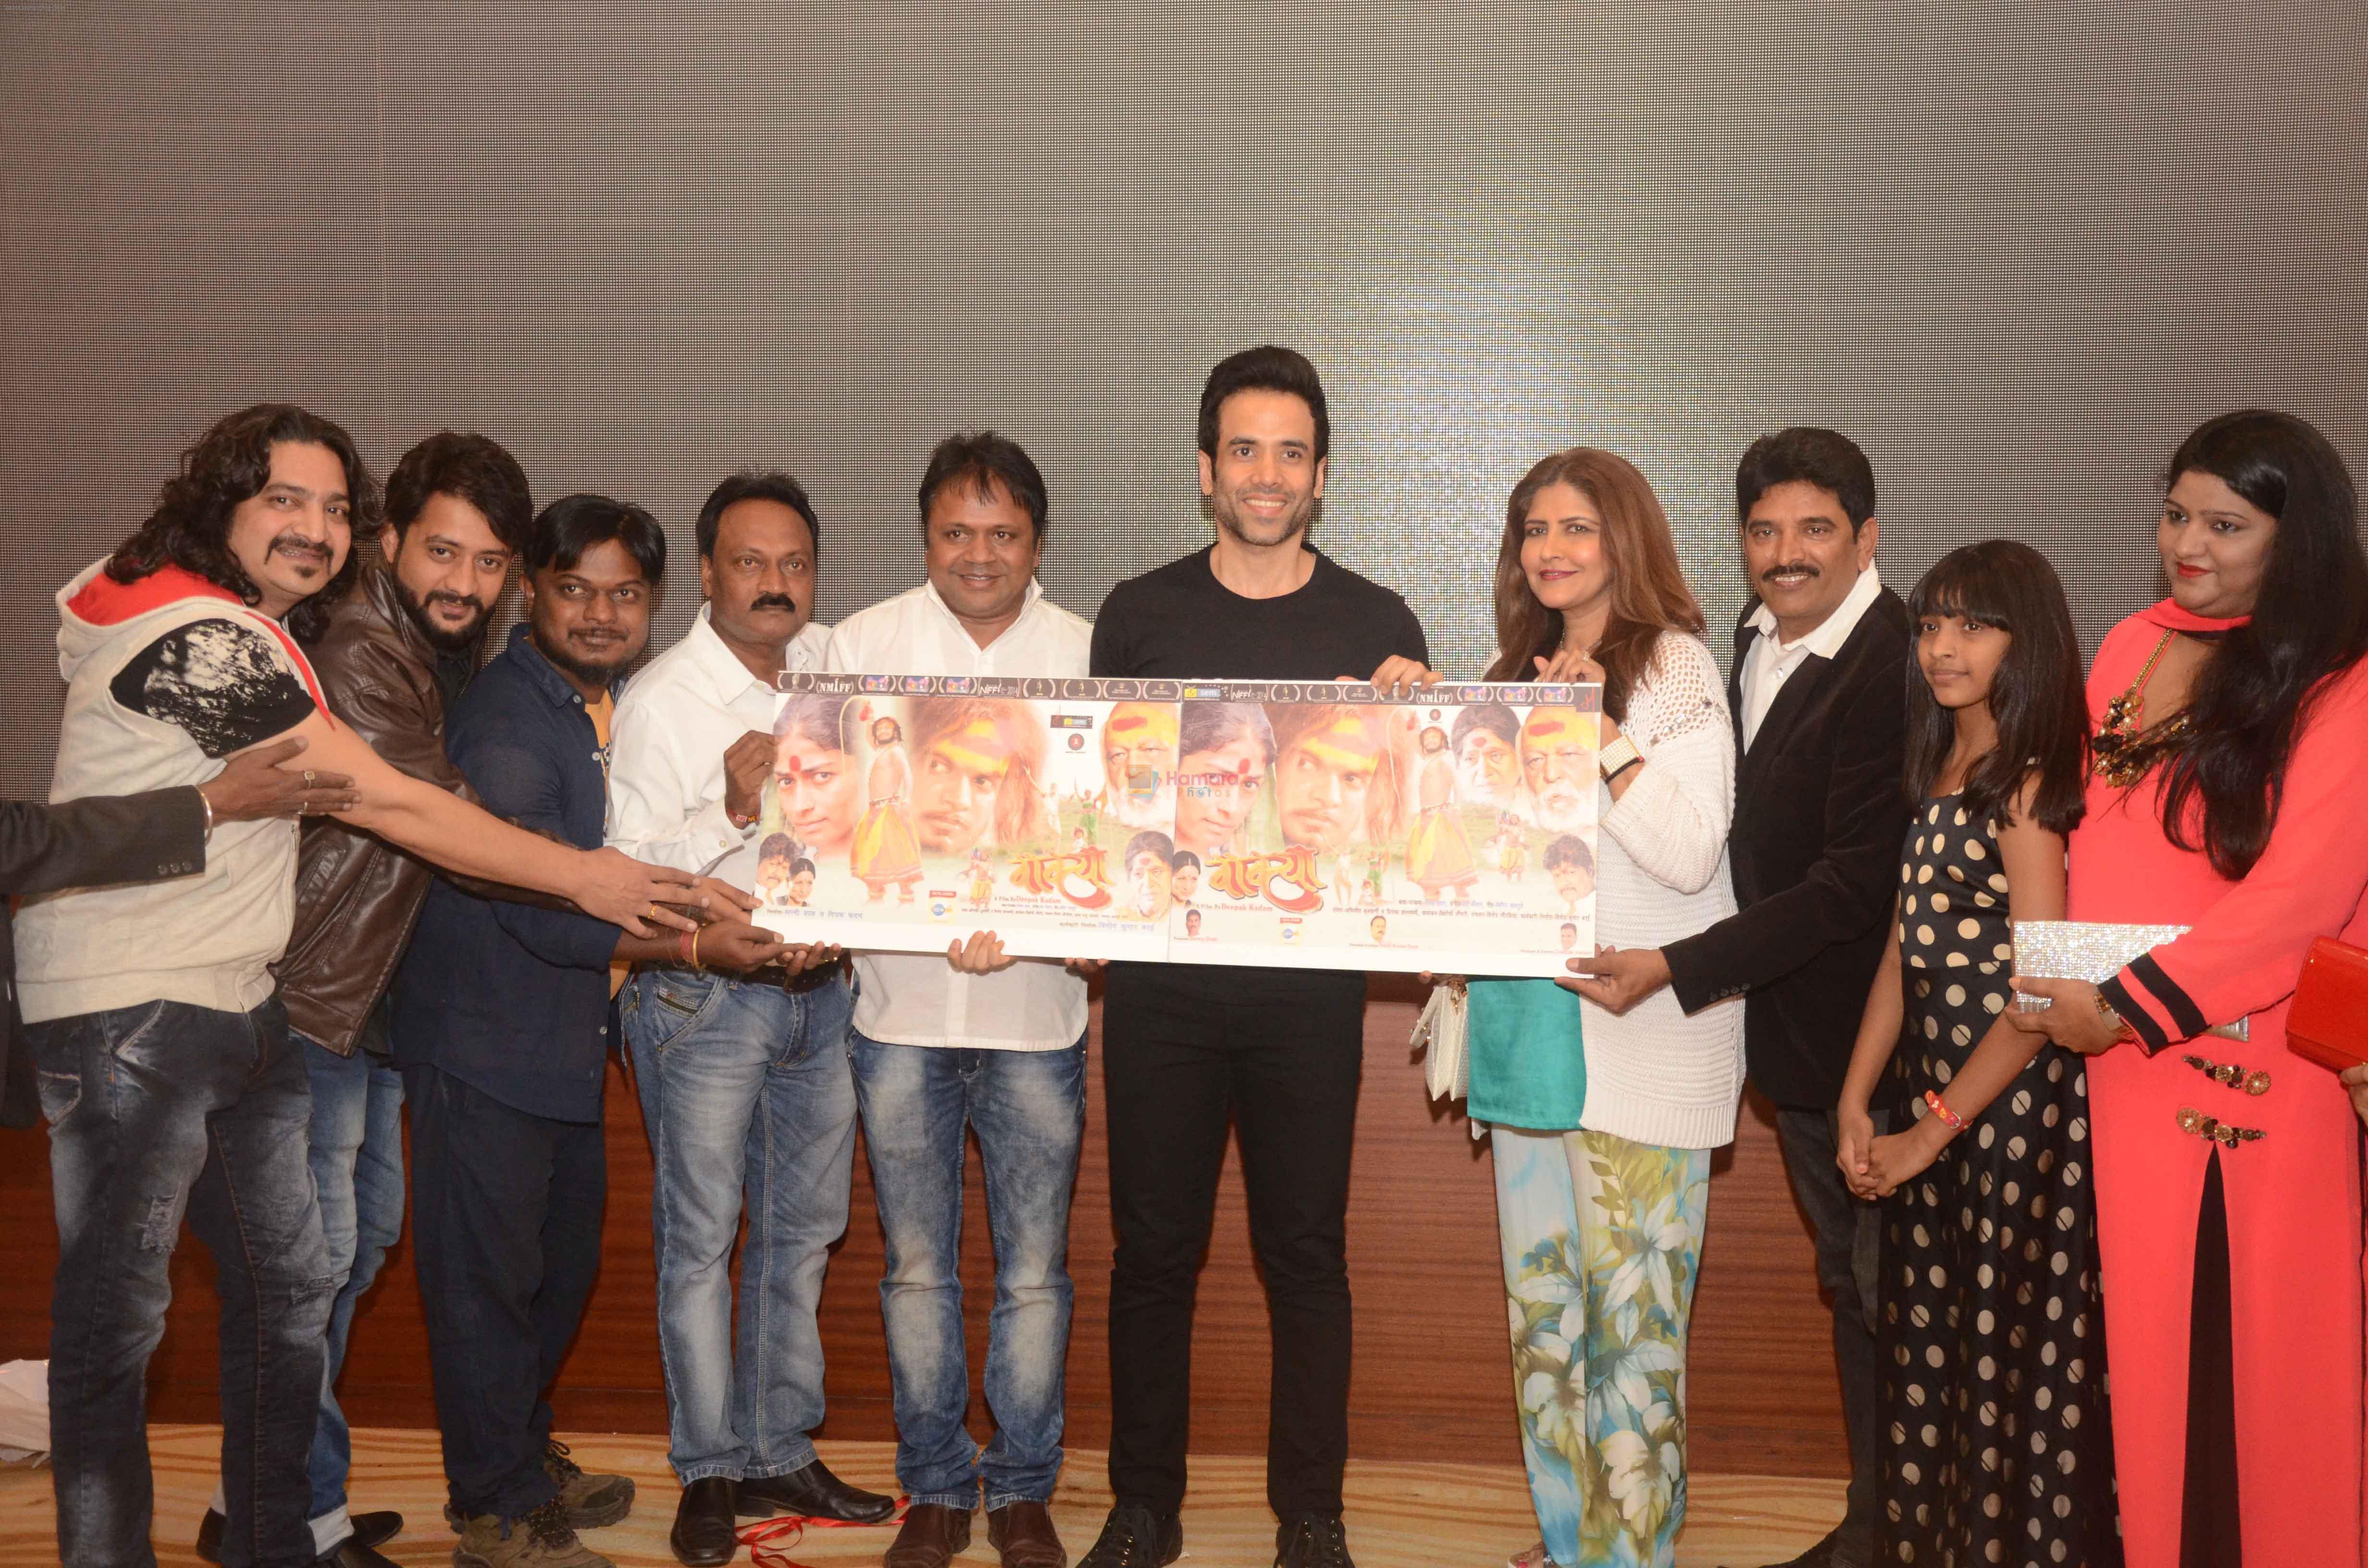 Tusshar Kapoor launches the Music of Marathi film Waakya on 12th Feb 2017